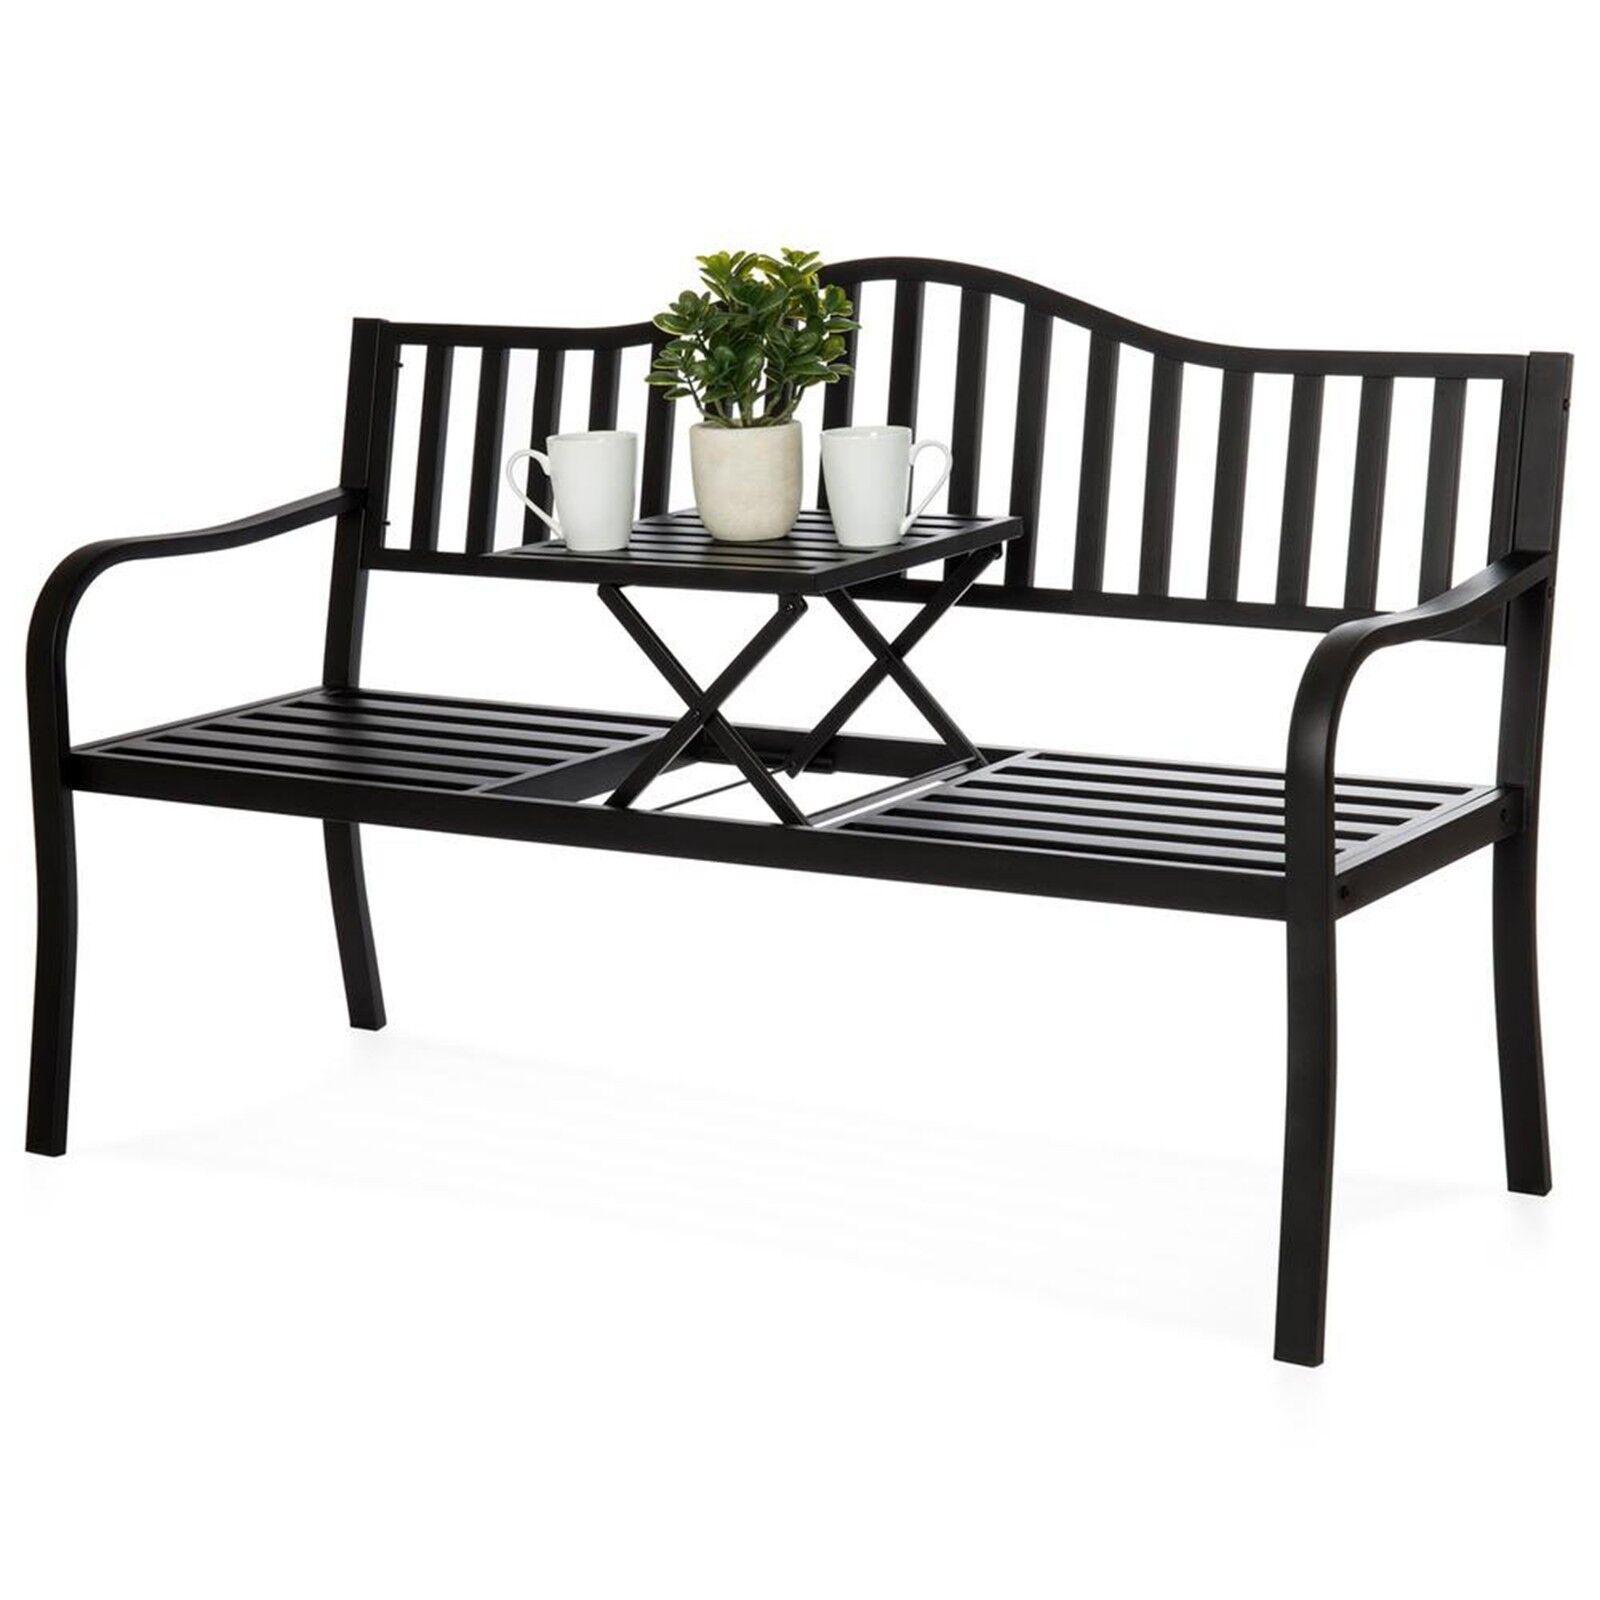 Metal Garden Bench Cast Iron Patio Furniture Porch Seat Adjustable Table Steel 718569027351 Ebay